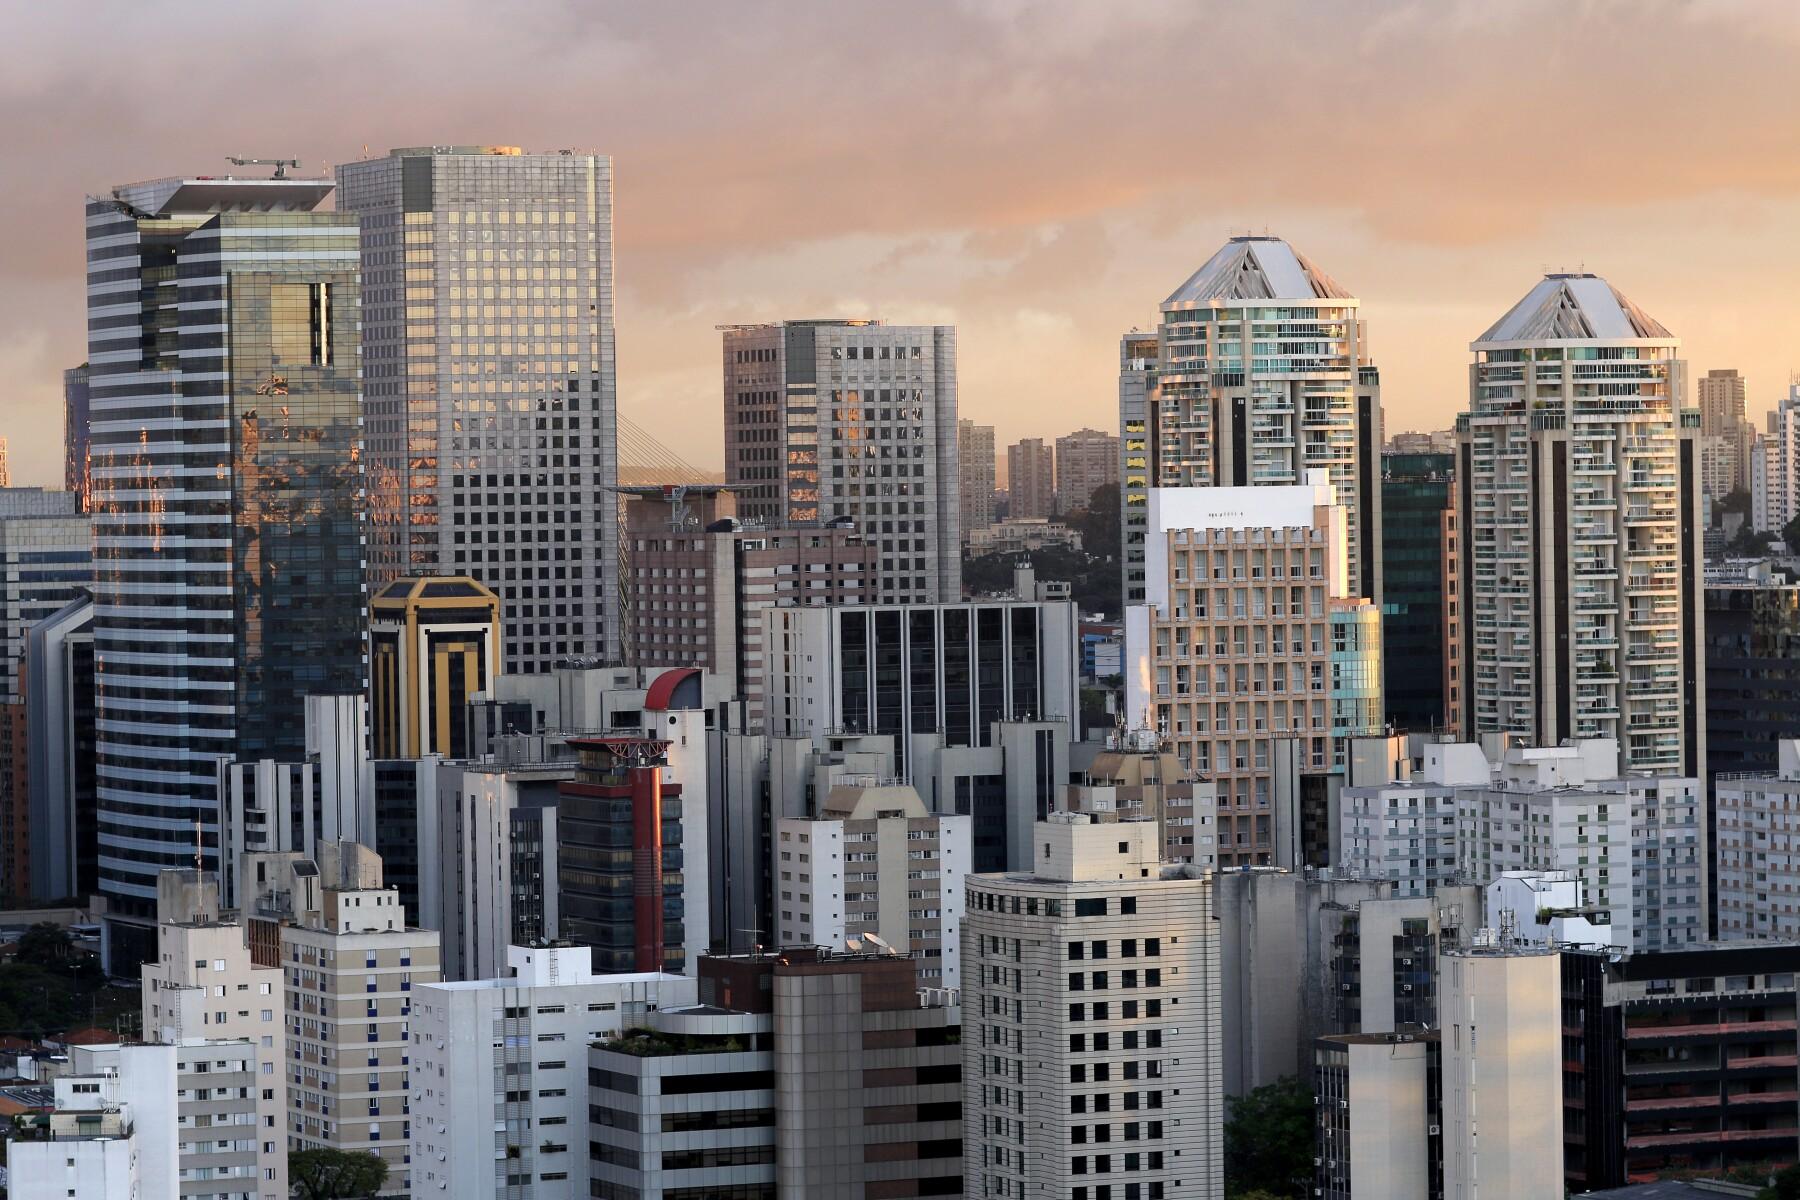 Building the city of Sao Paulo, South America Brazil